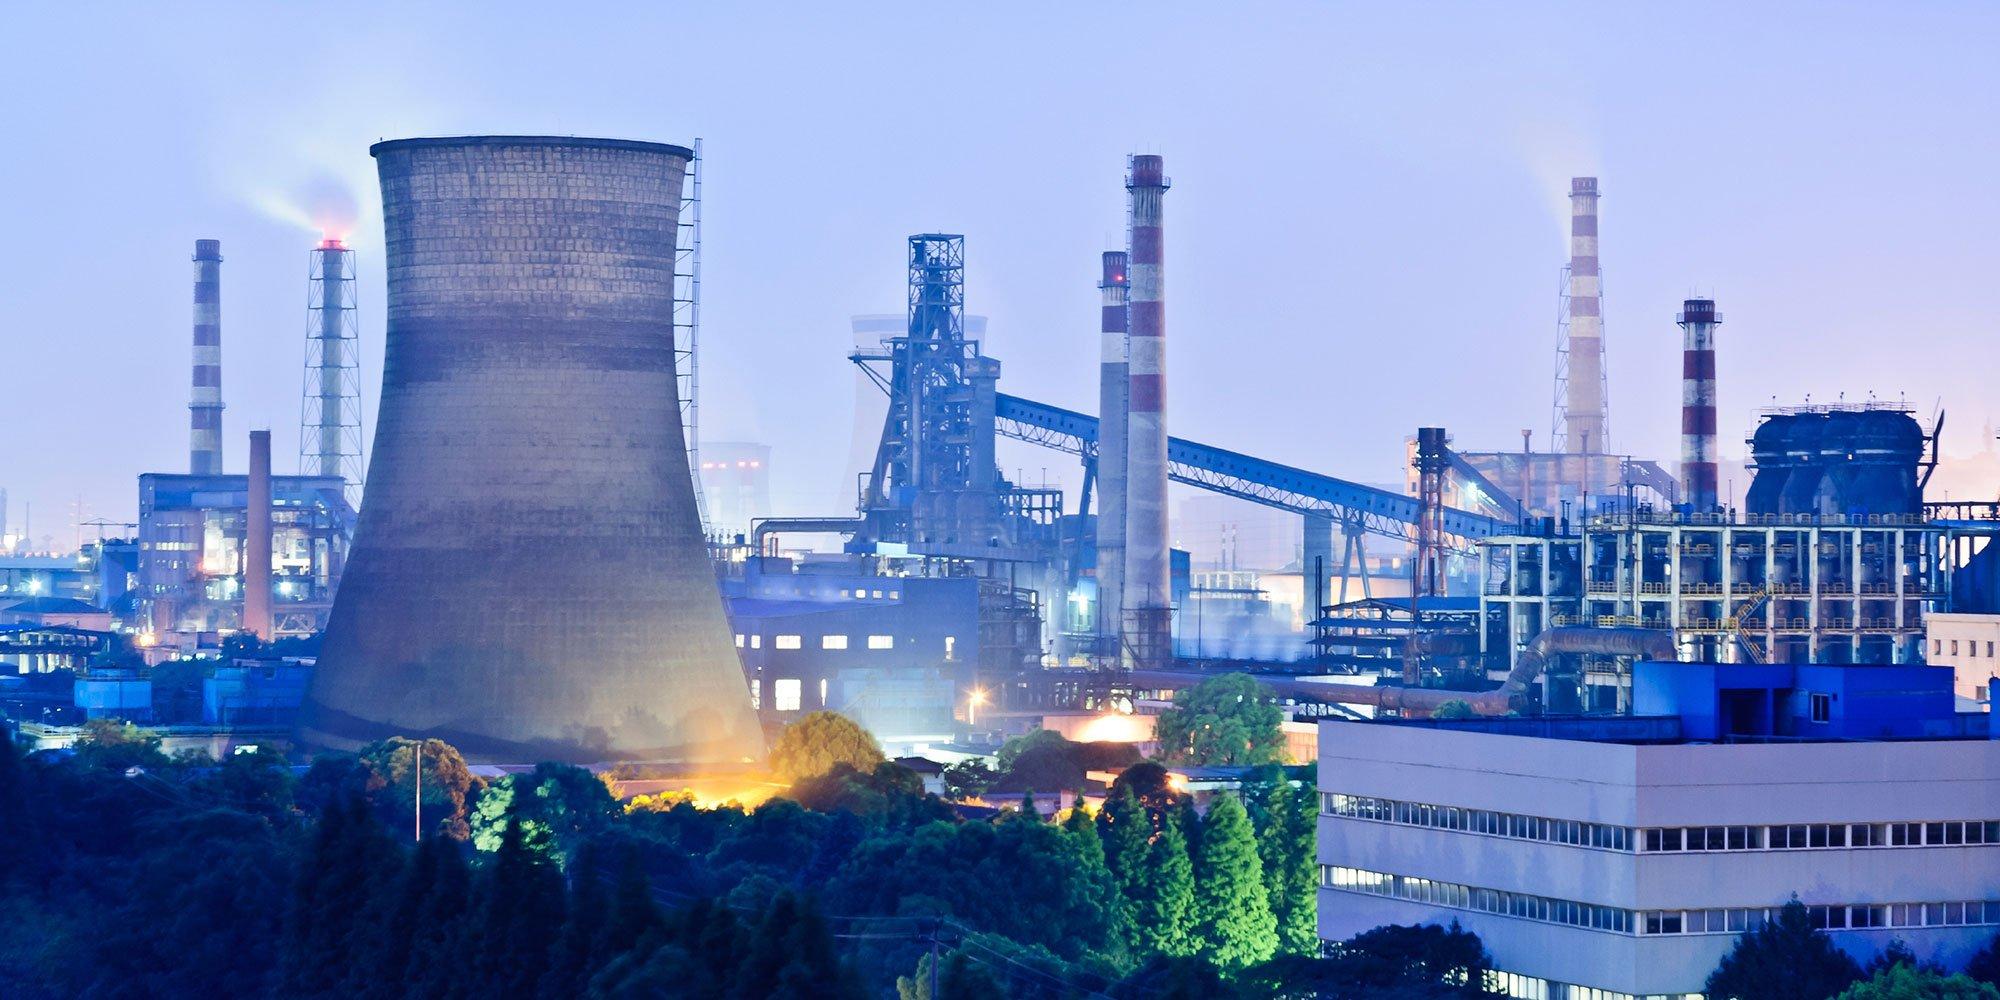 Industrial Windsocks